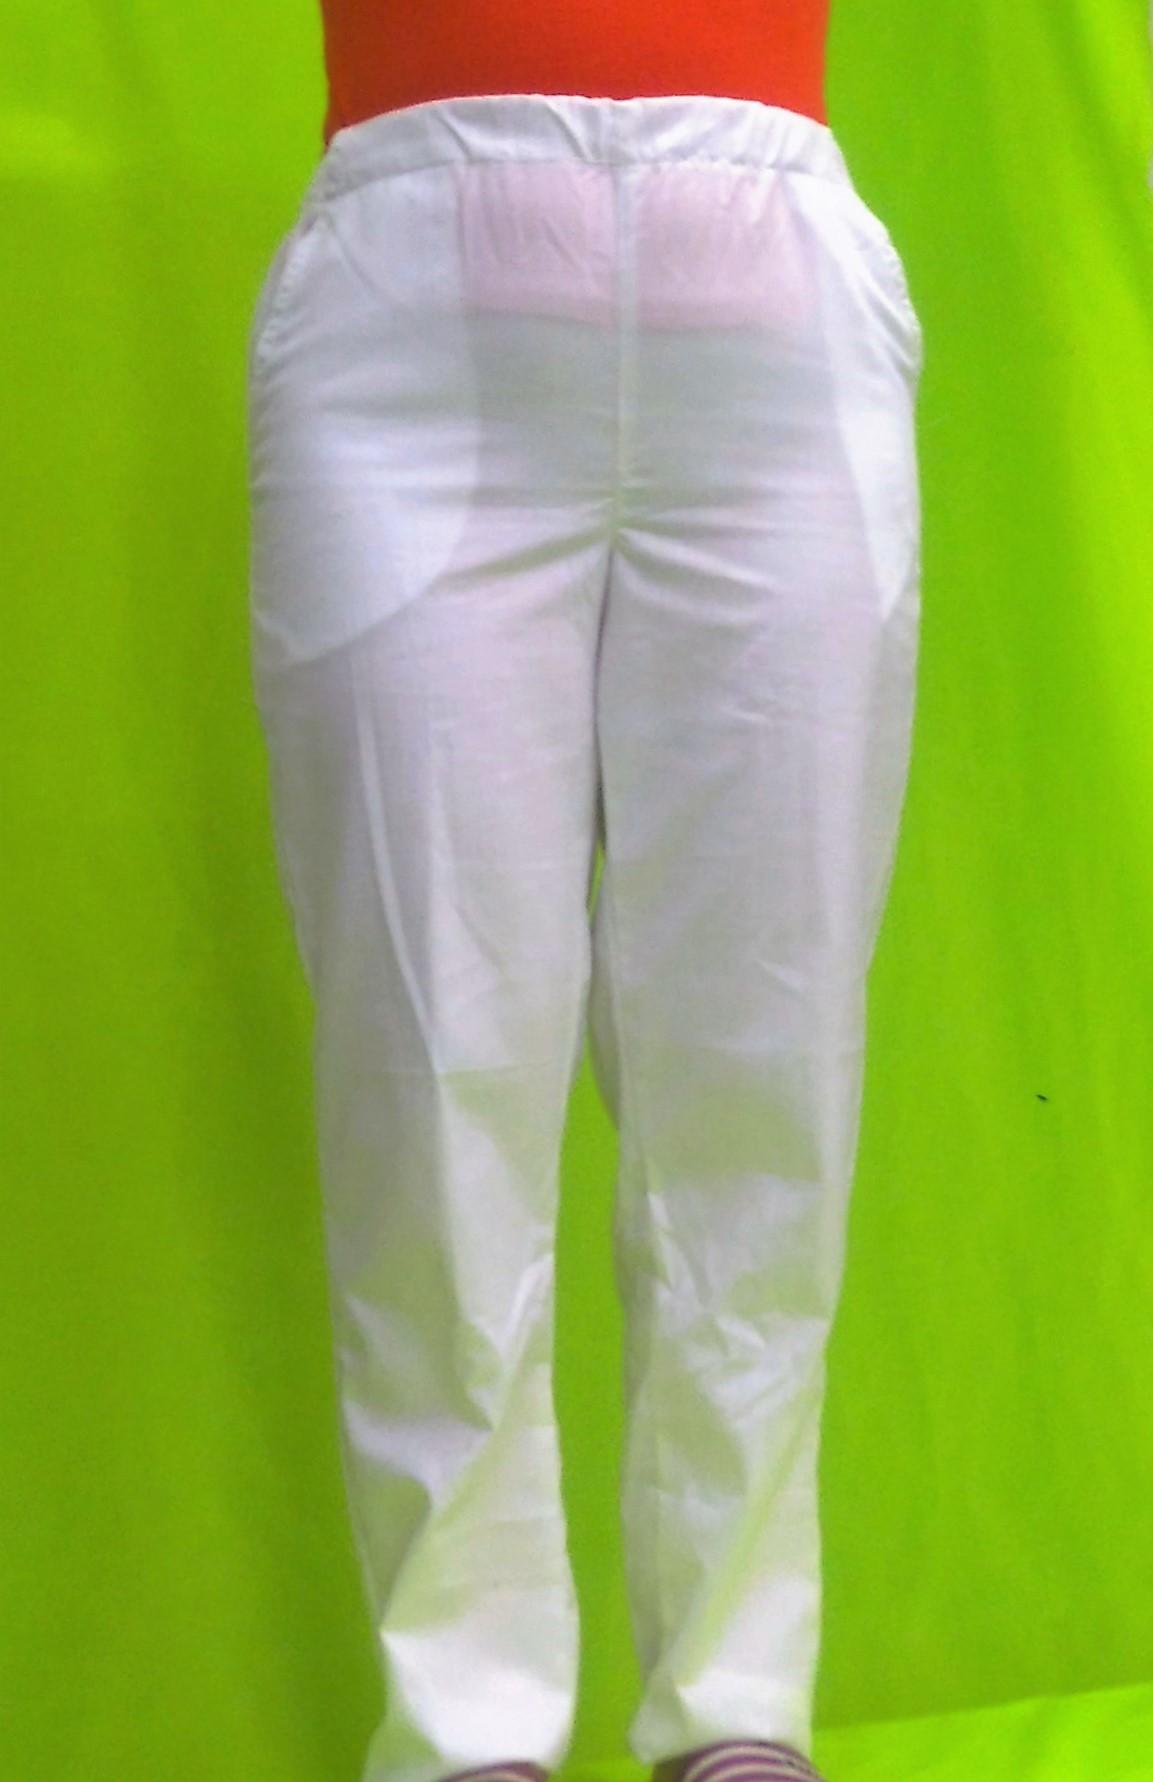 7971454f977f Dámske kucharske nohavice biele